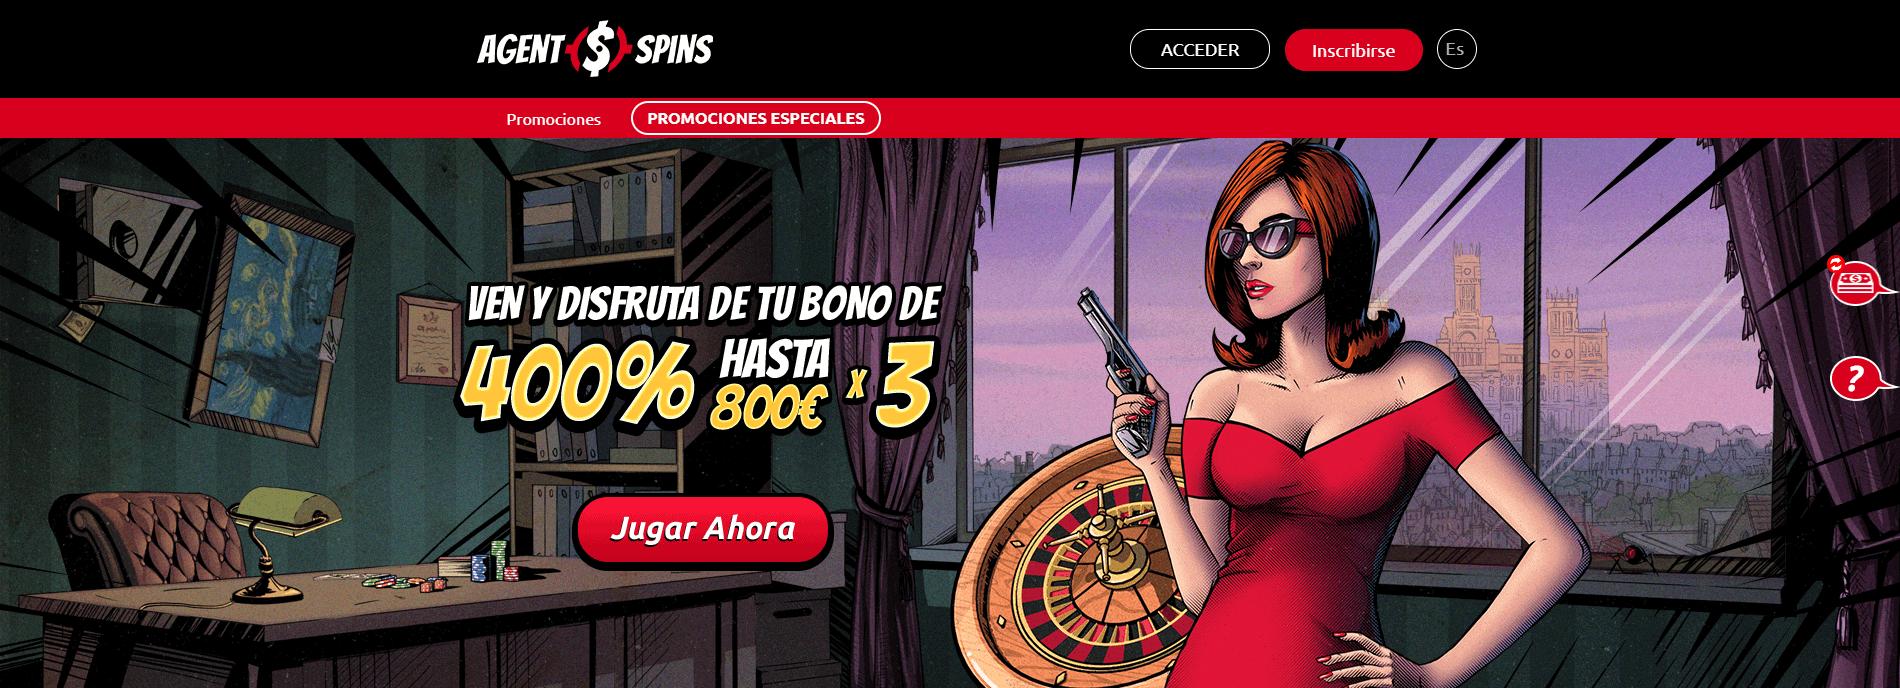 Agent Spins Promociones